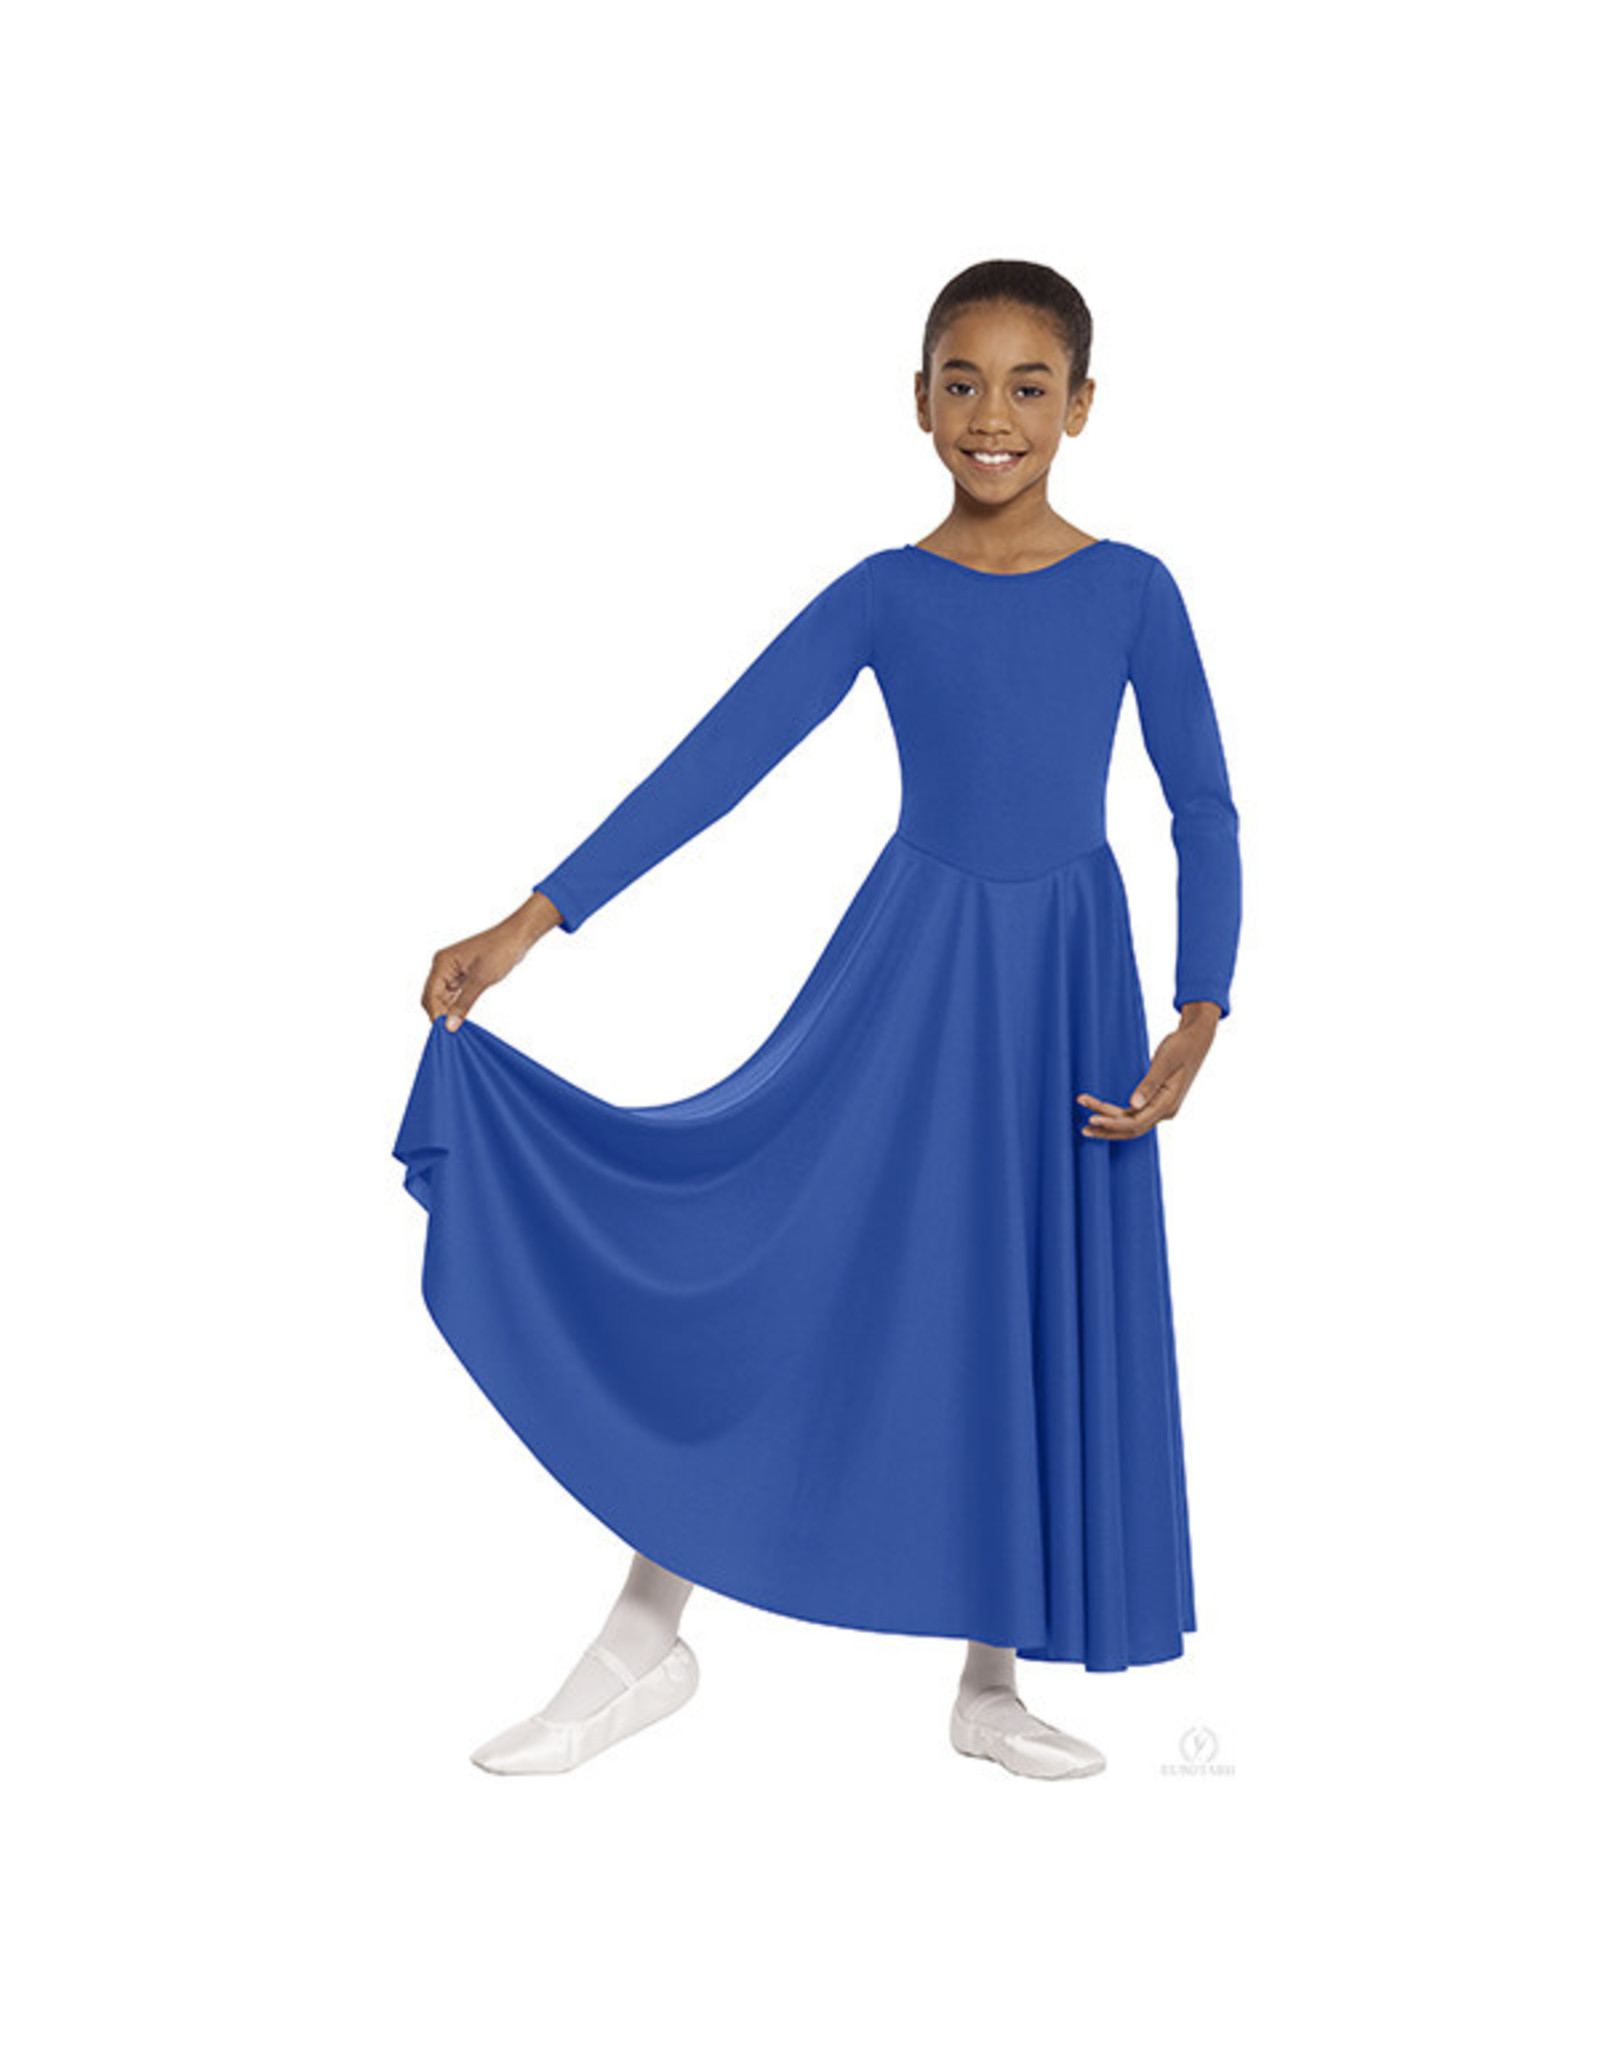 13524C CHILD LITURGICAL DRESS BLUE